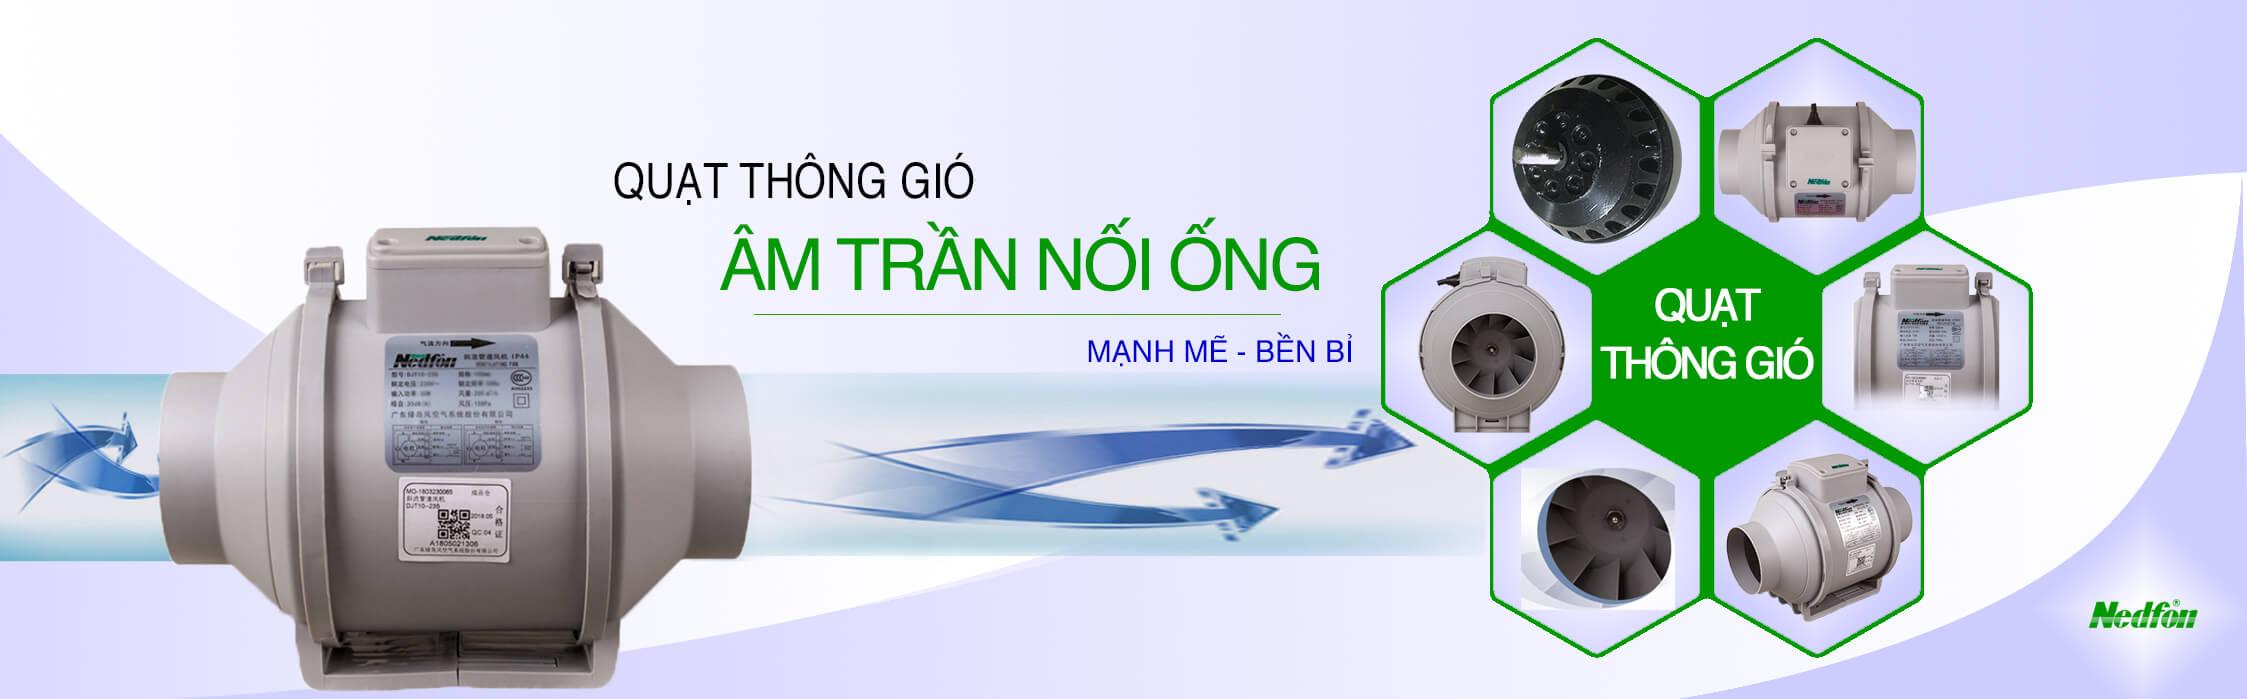 quat-thong-gio-nedfon-banner1